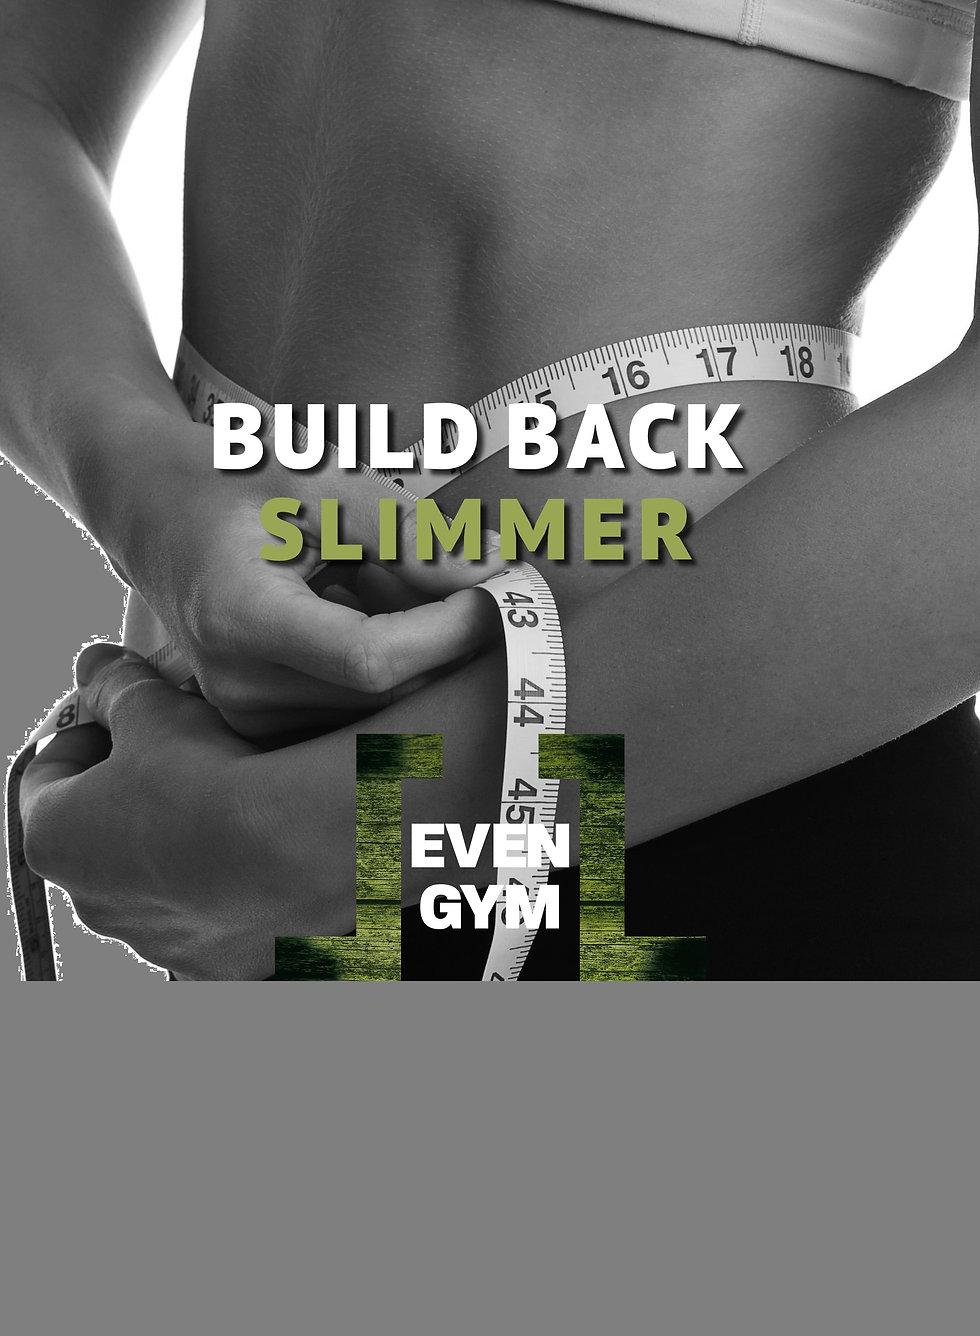 Build Back Slimmer website.jpg